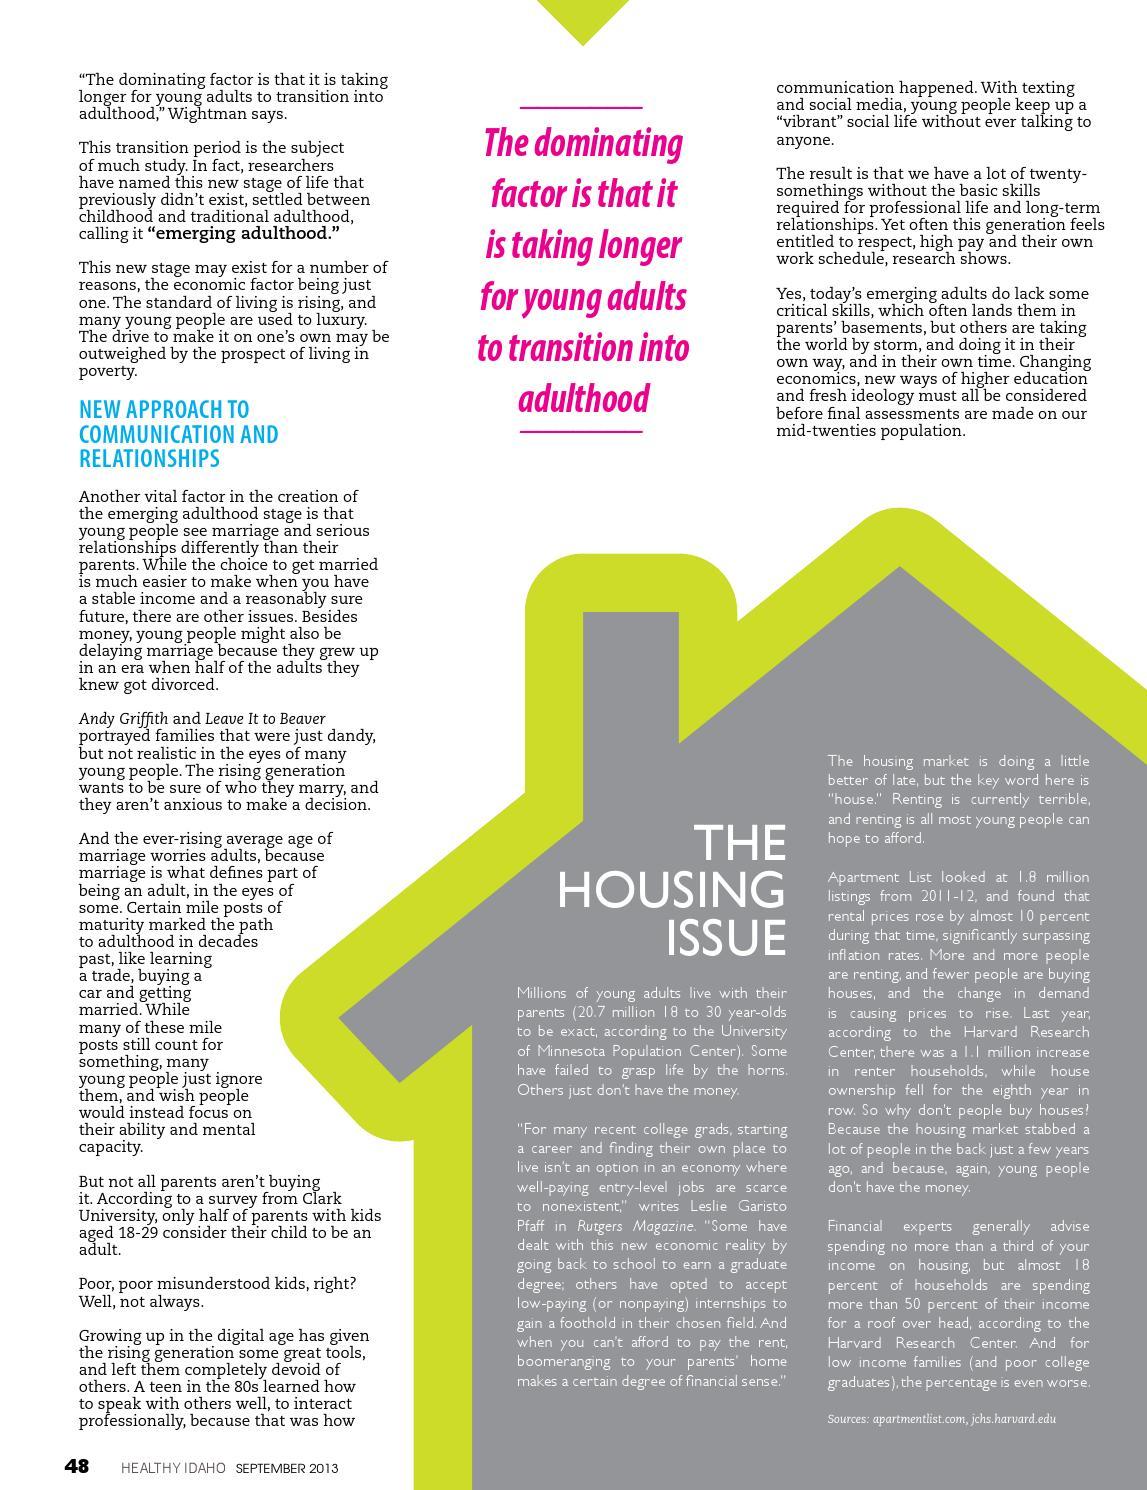 Healthy Idaho | September '13 by Healthy Magazine - issuu